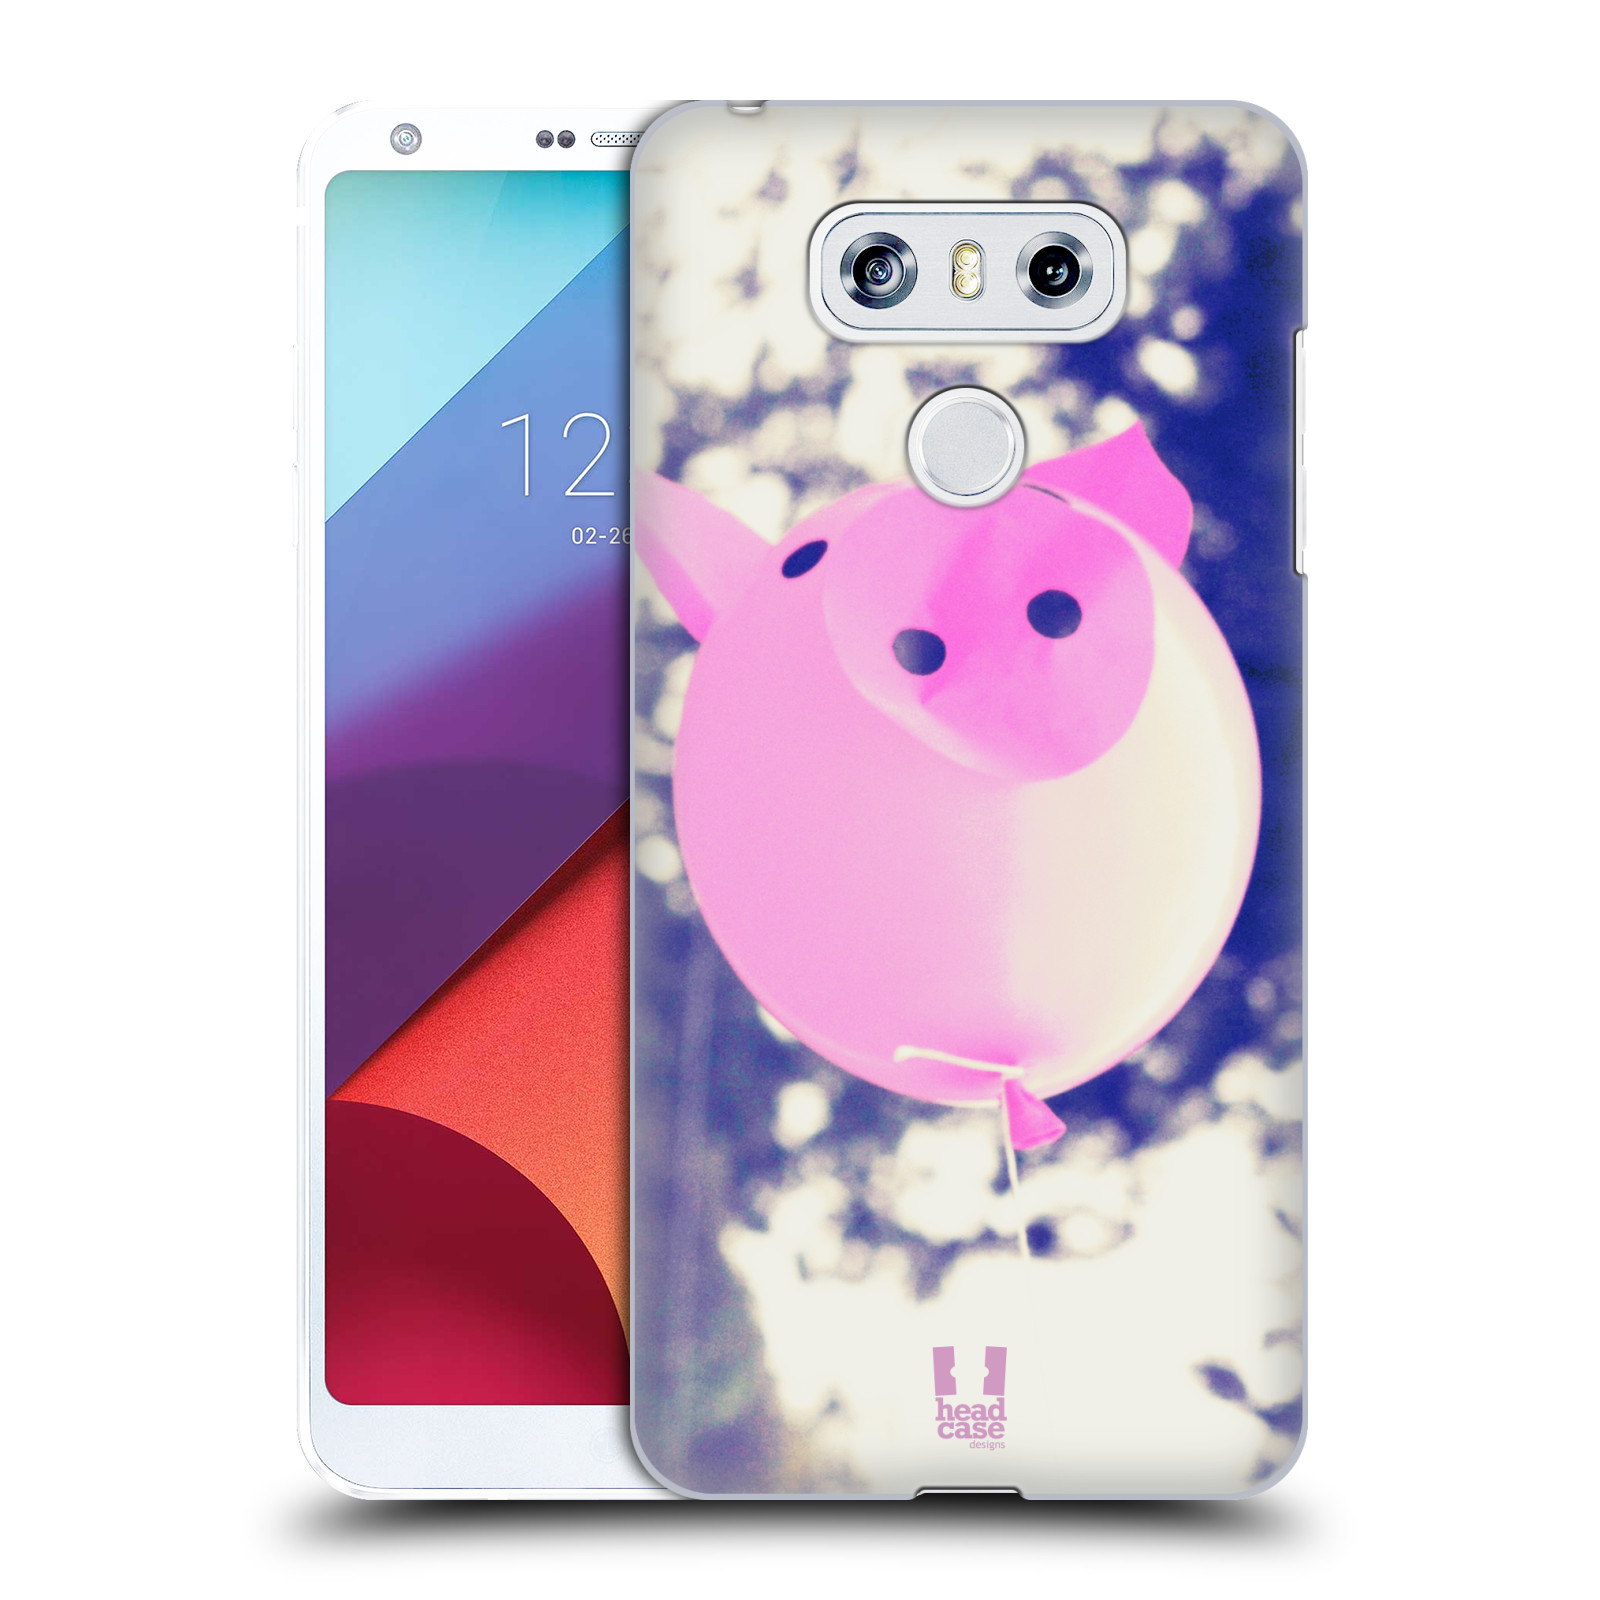 Plastové pouzdro na mobil LG G6 - Head Case BALON PAŠÍK